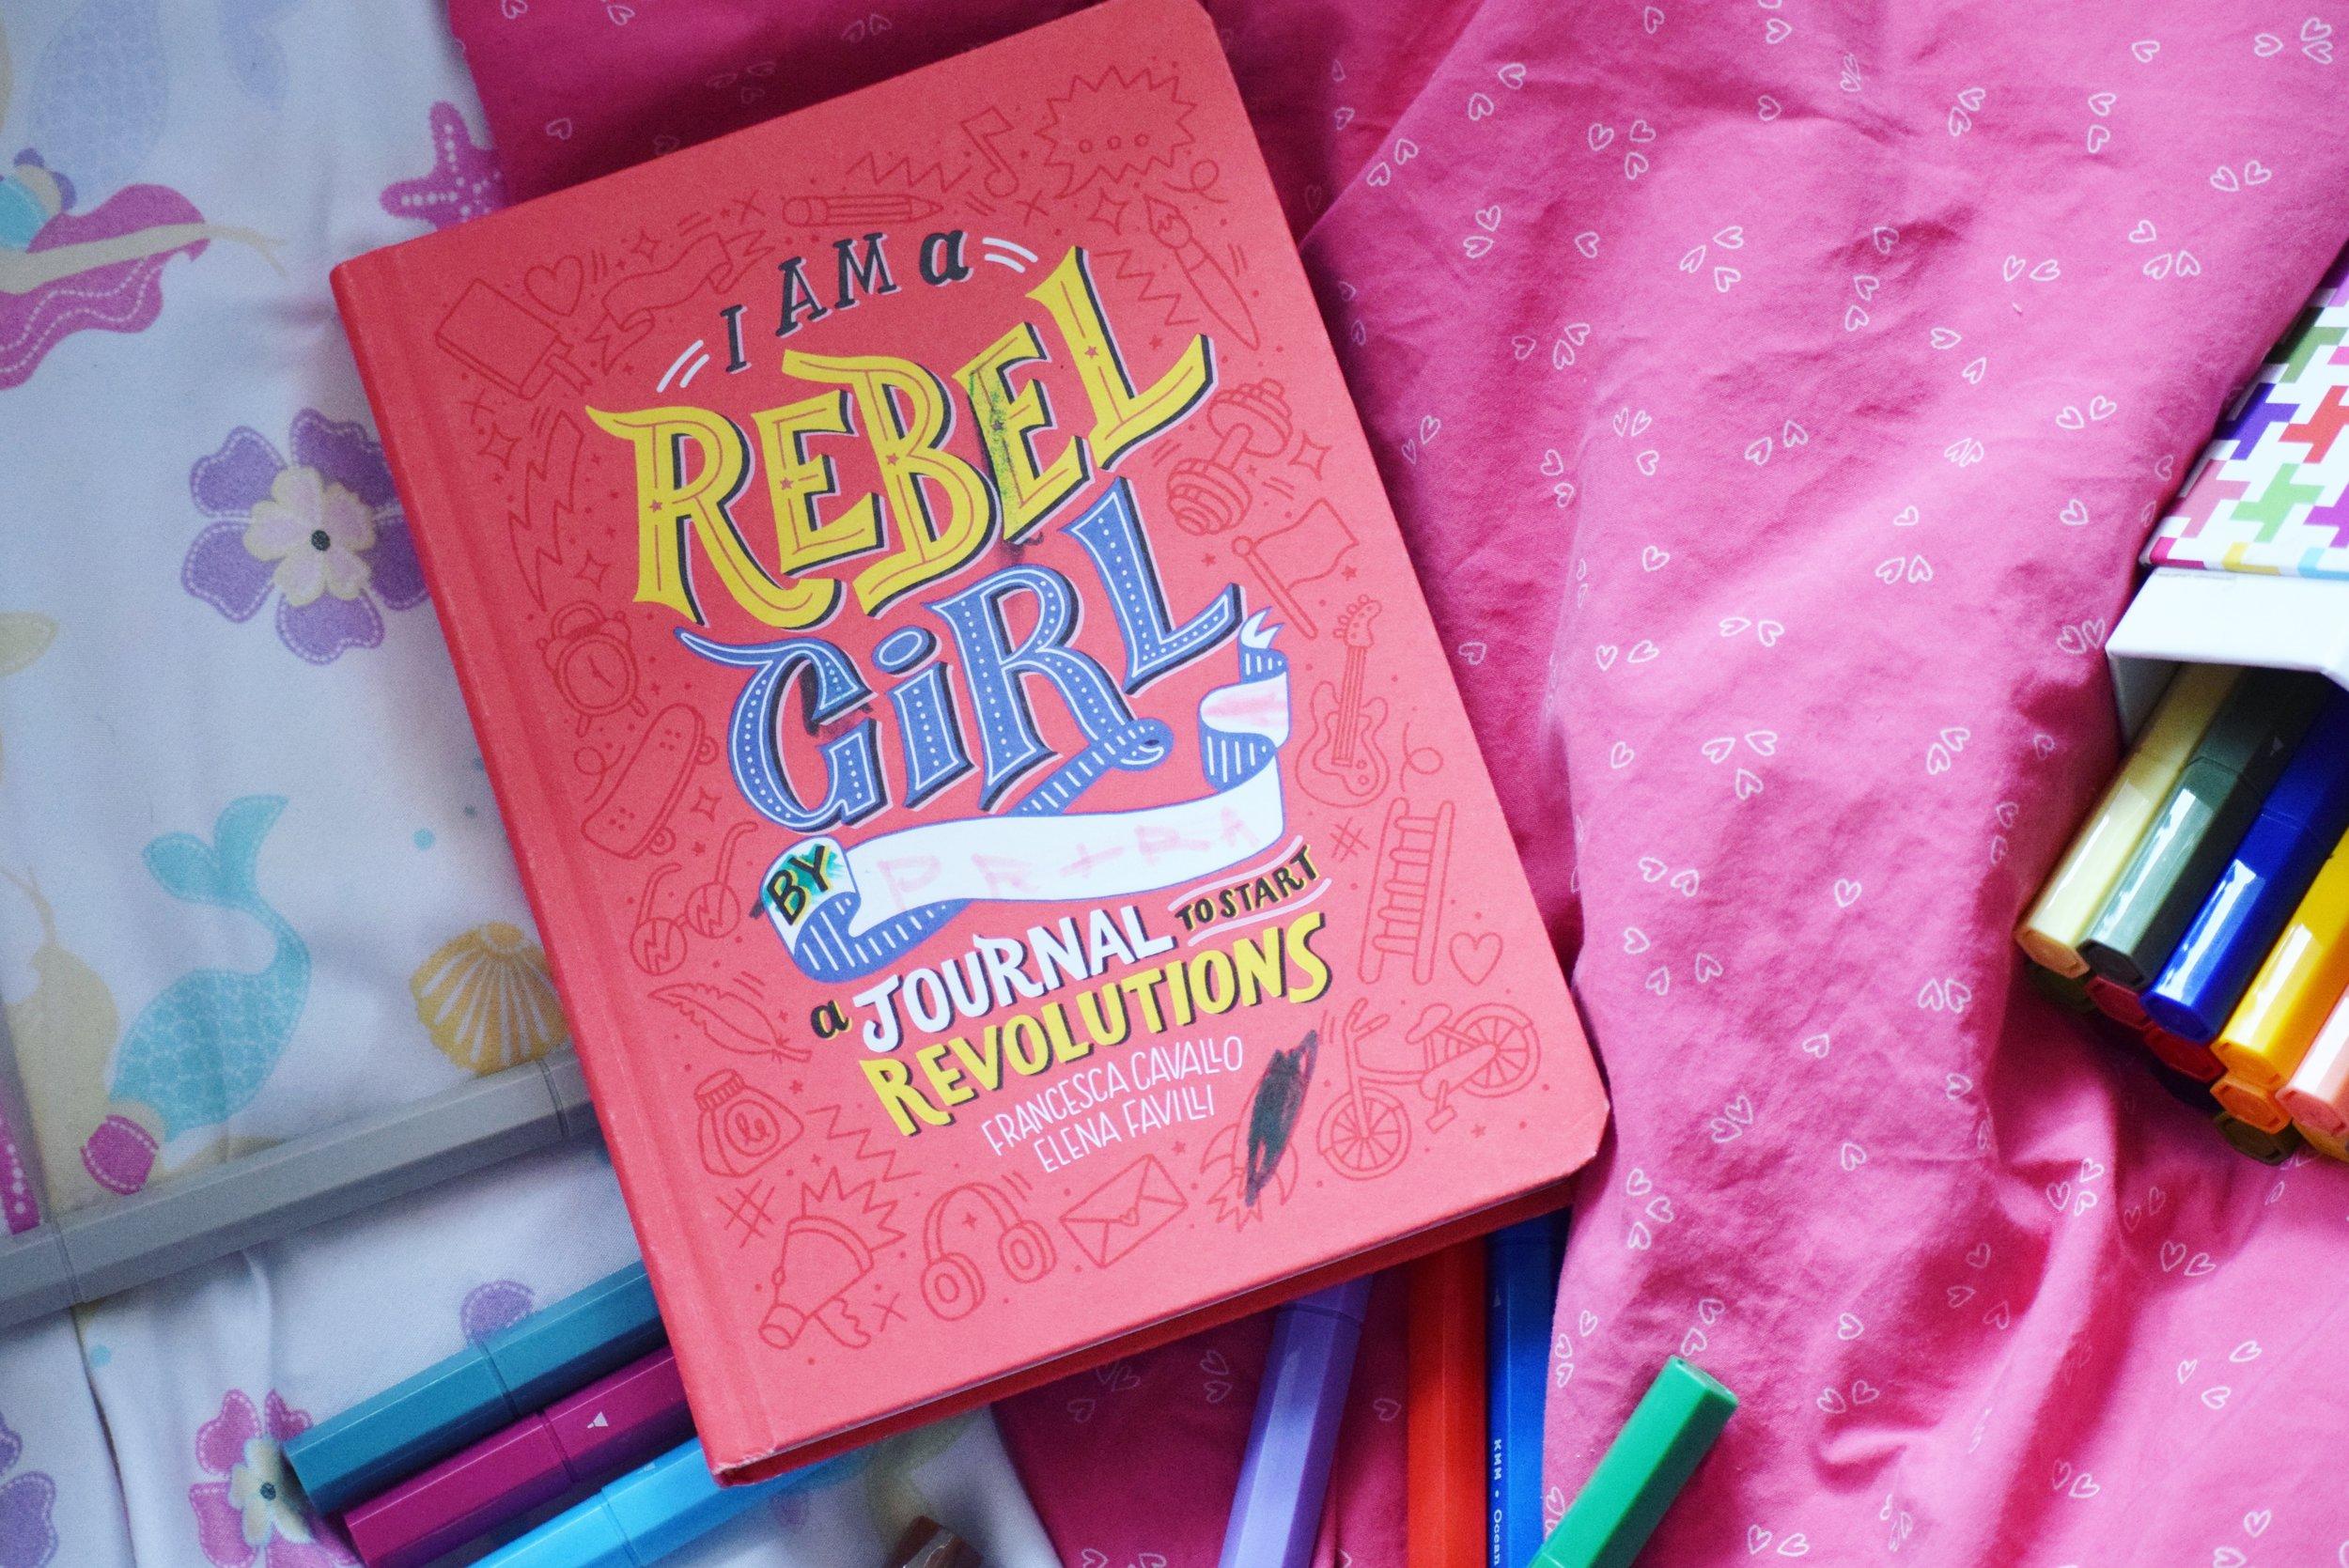 i am a rebel girl guided childrens journal canada 2.jpg